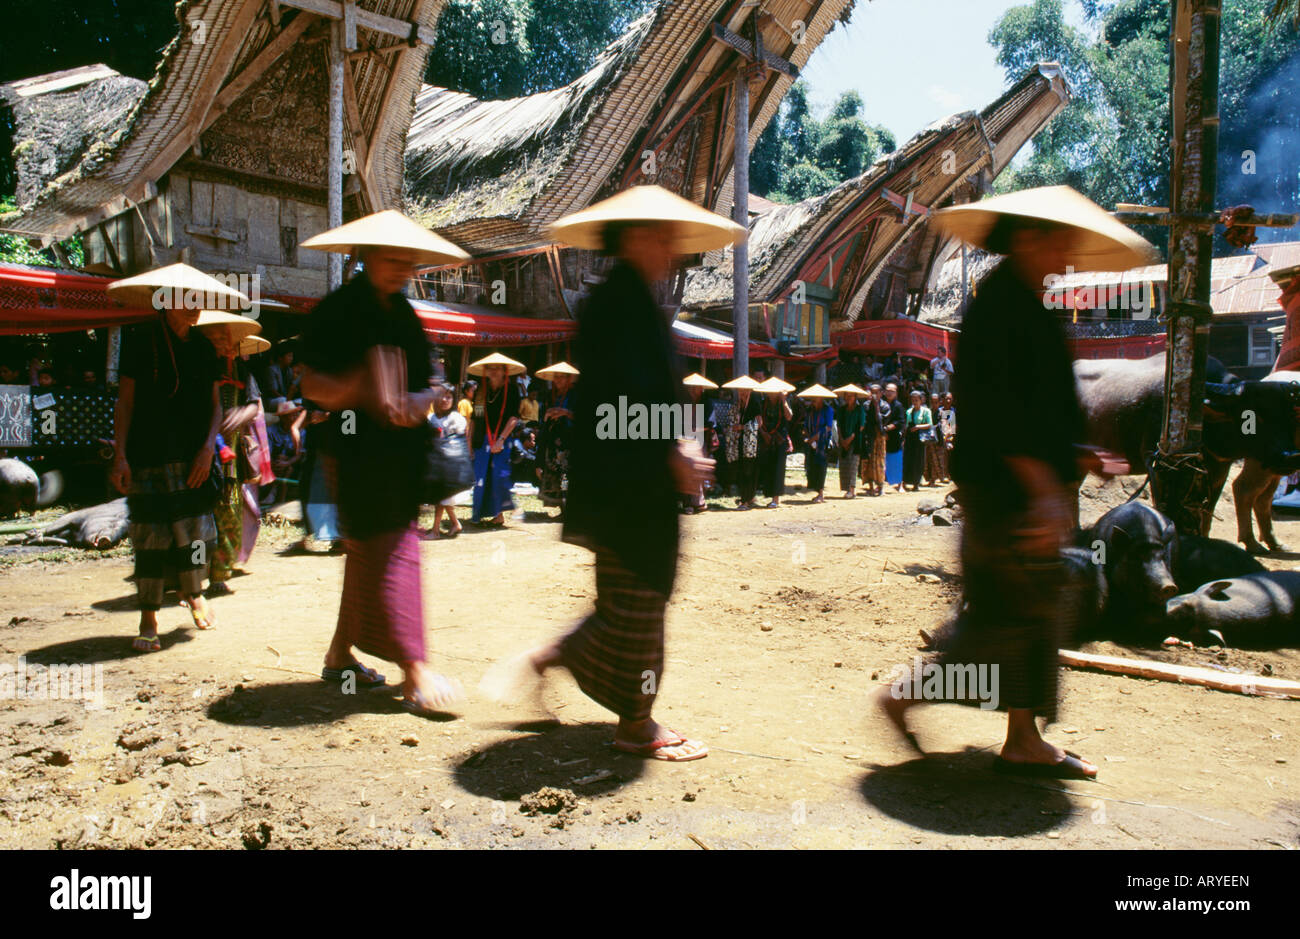 Funeral procession, torajaland - Stock Image